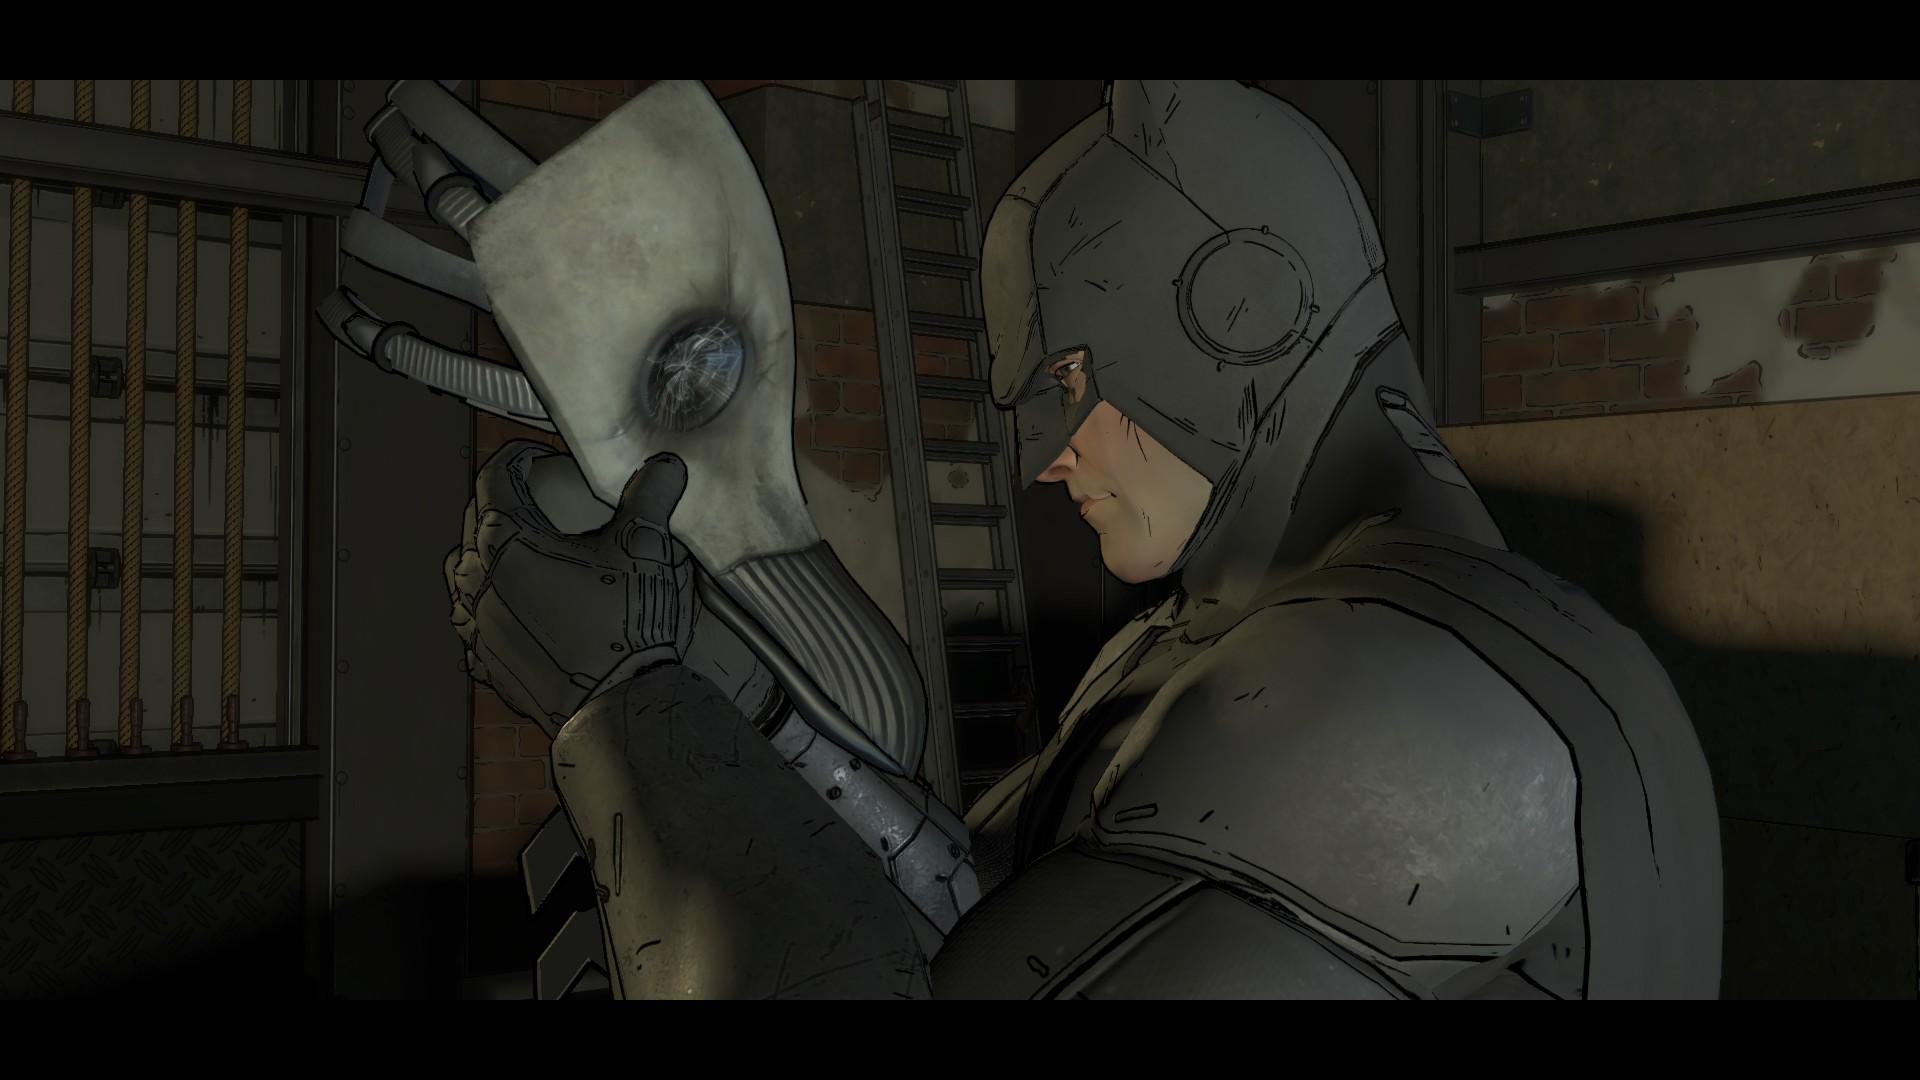 Batman: The Telltale Series Episode 2 - Children of Arkham - Image n°6